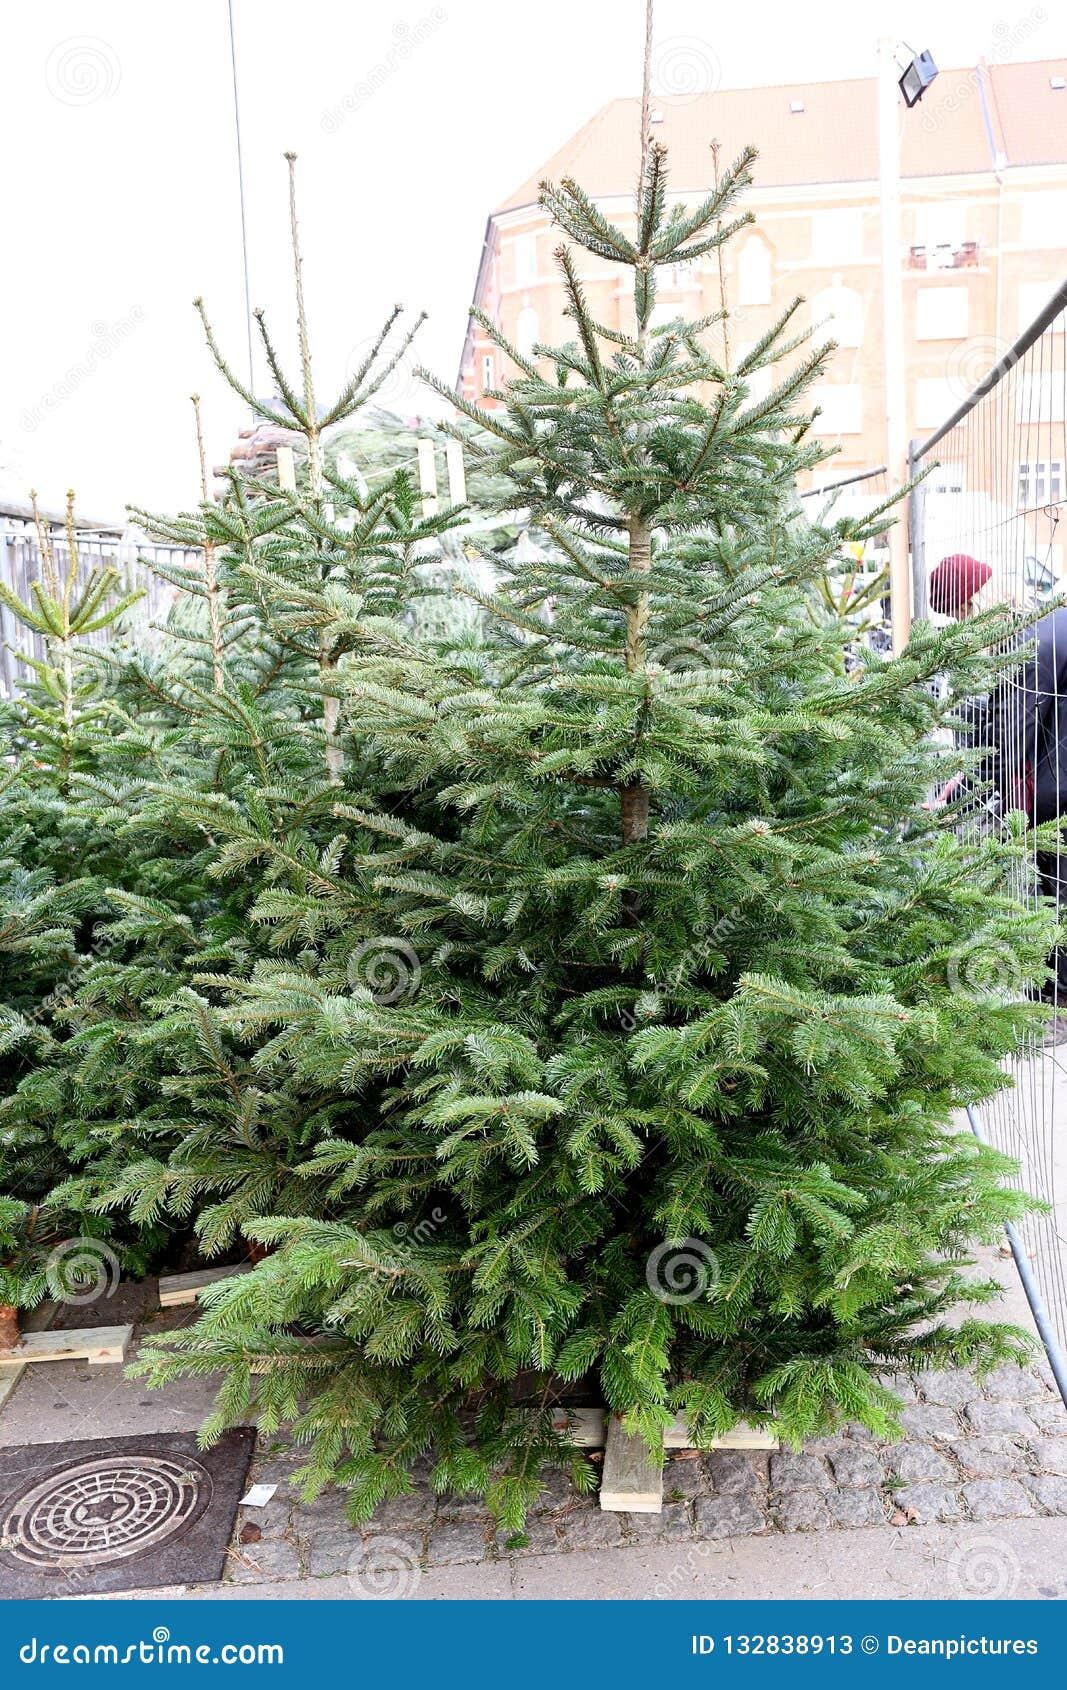 Christmas Trees For Sale.Green Christmas Trees For Sale In Copenhgen Denmark